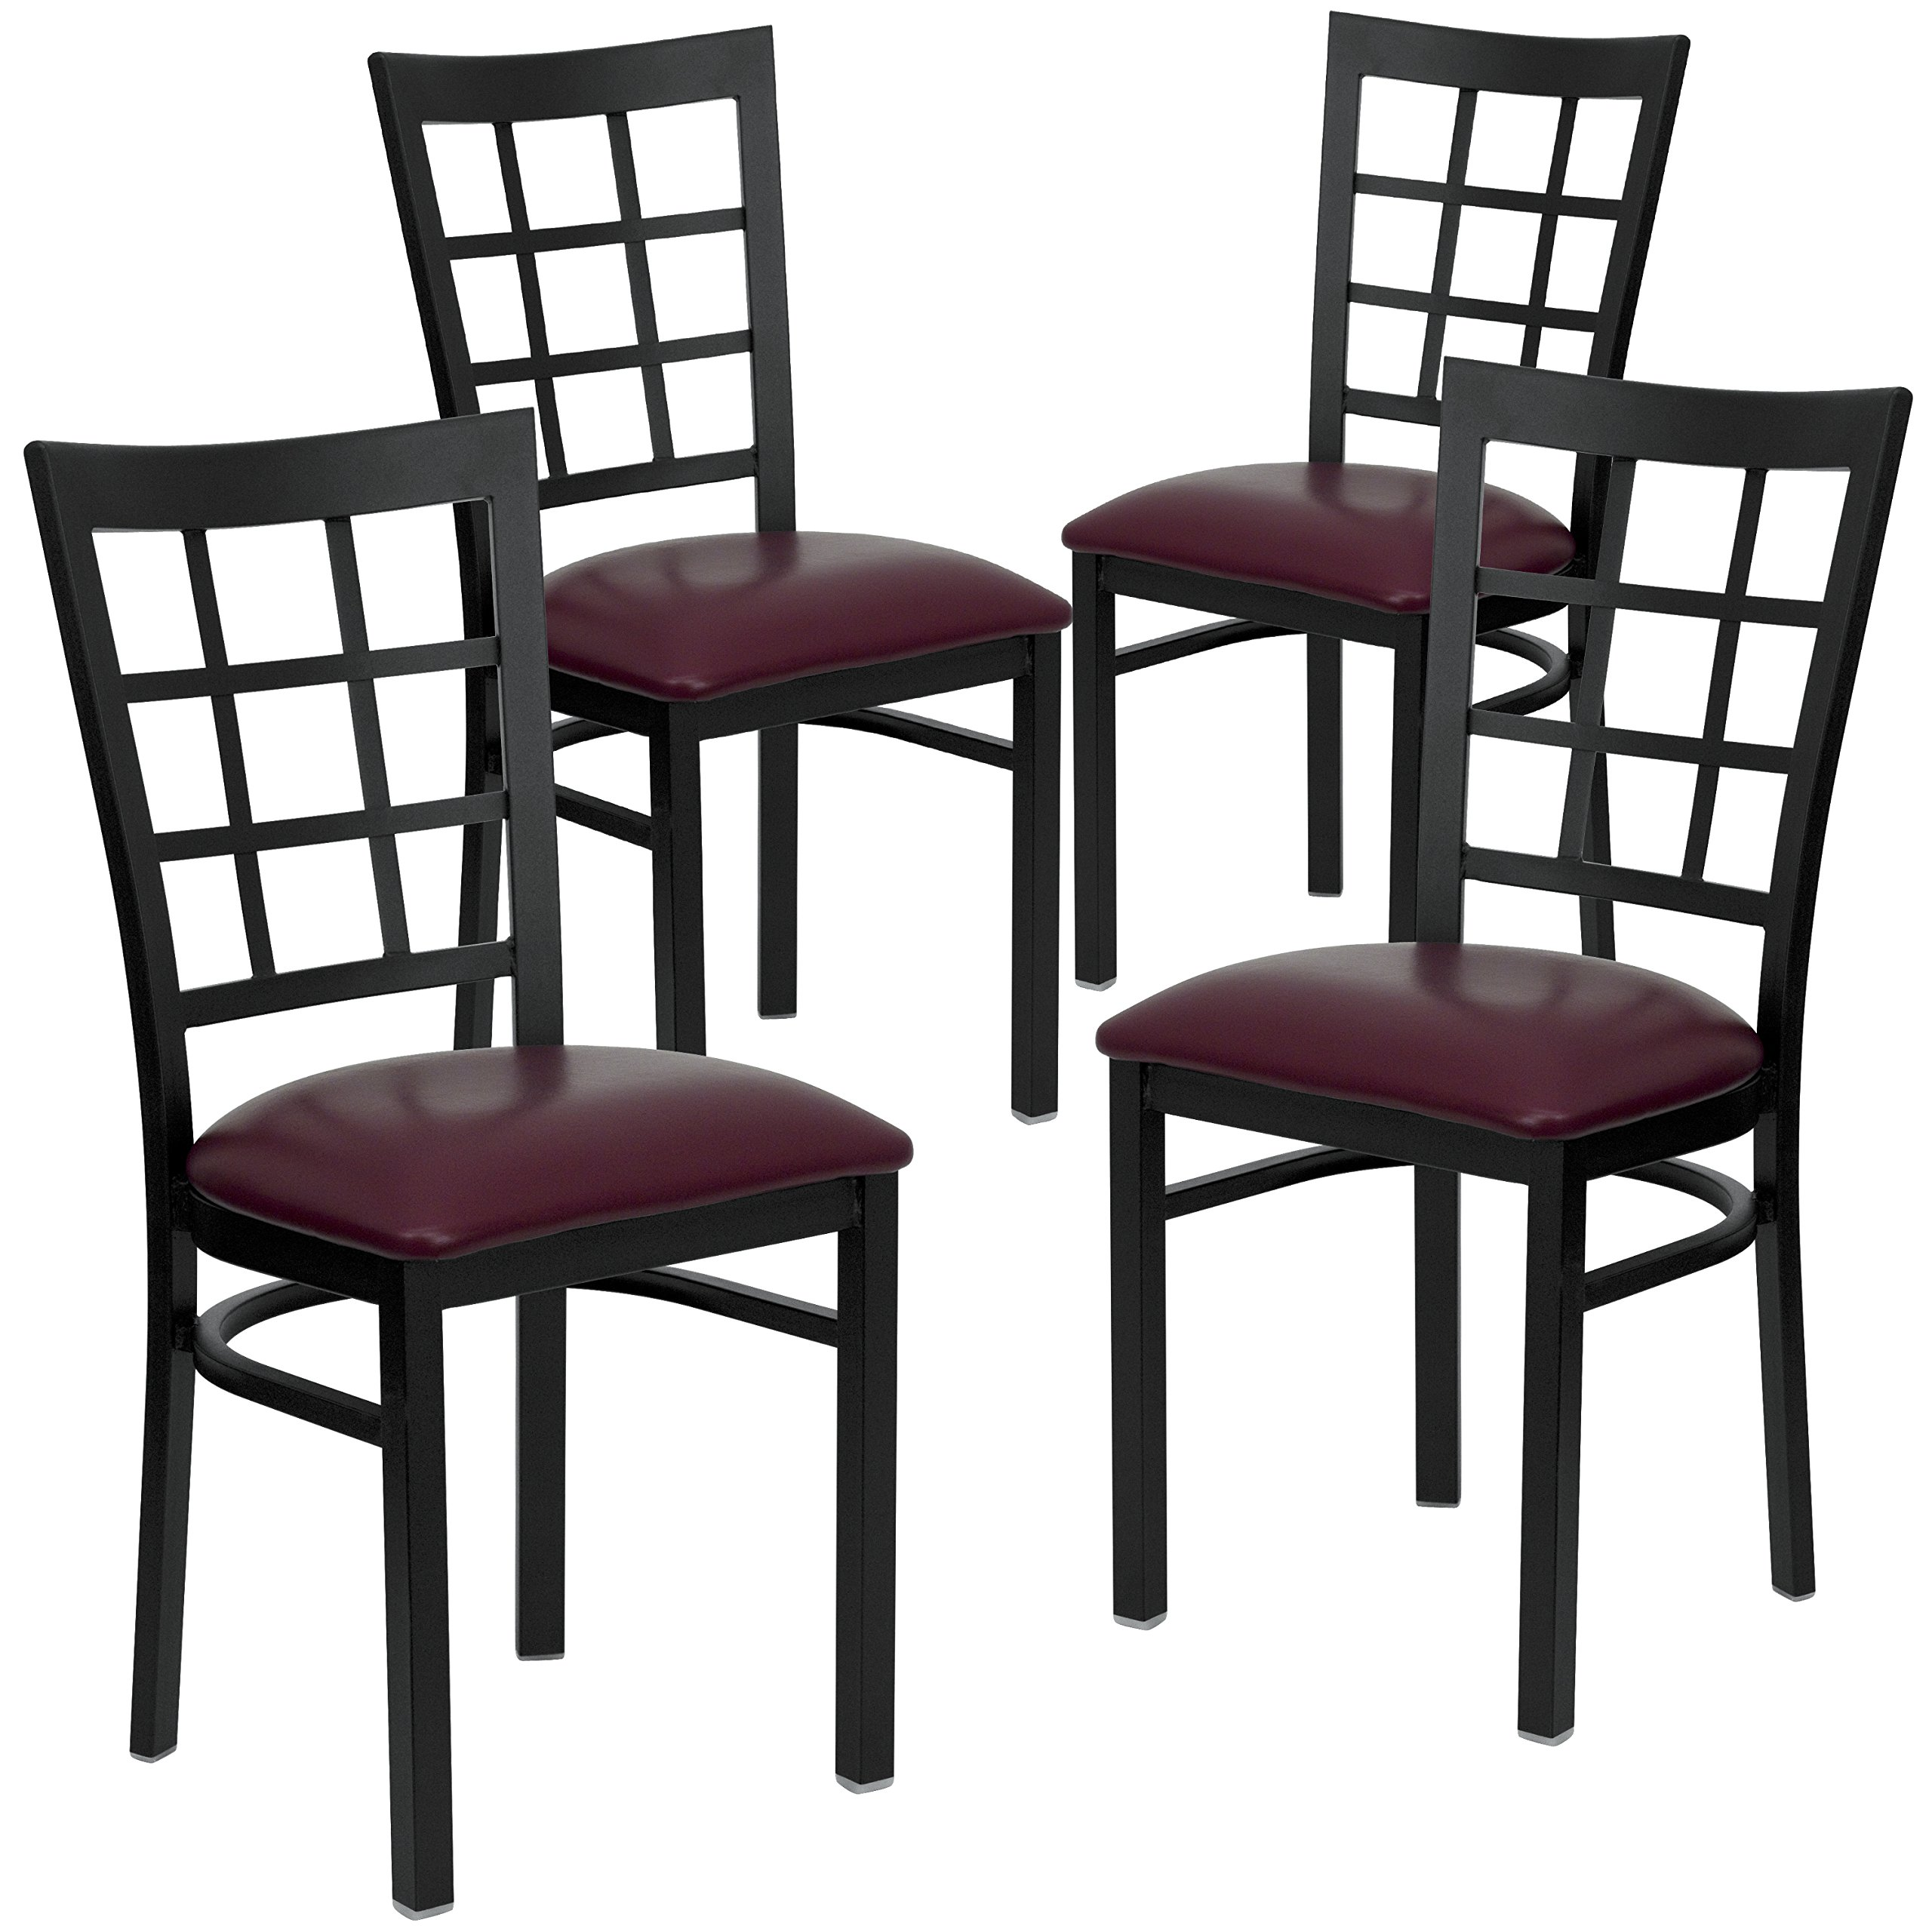 Flash Furniture 4 Pk. HERCULES Series Black Window Back Metal Restaurant Chair - Burgundy Vinyl Seat